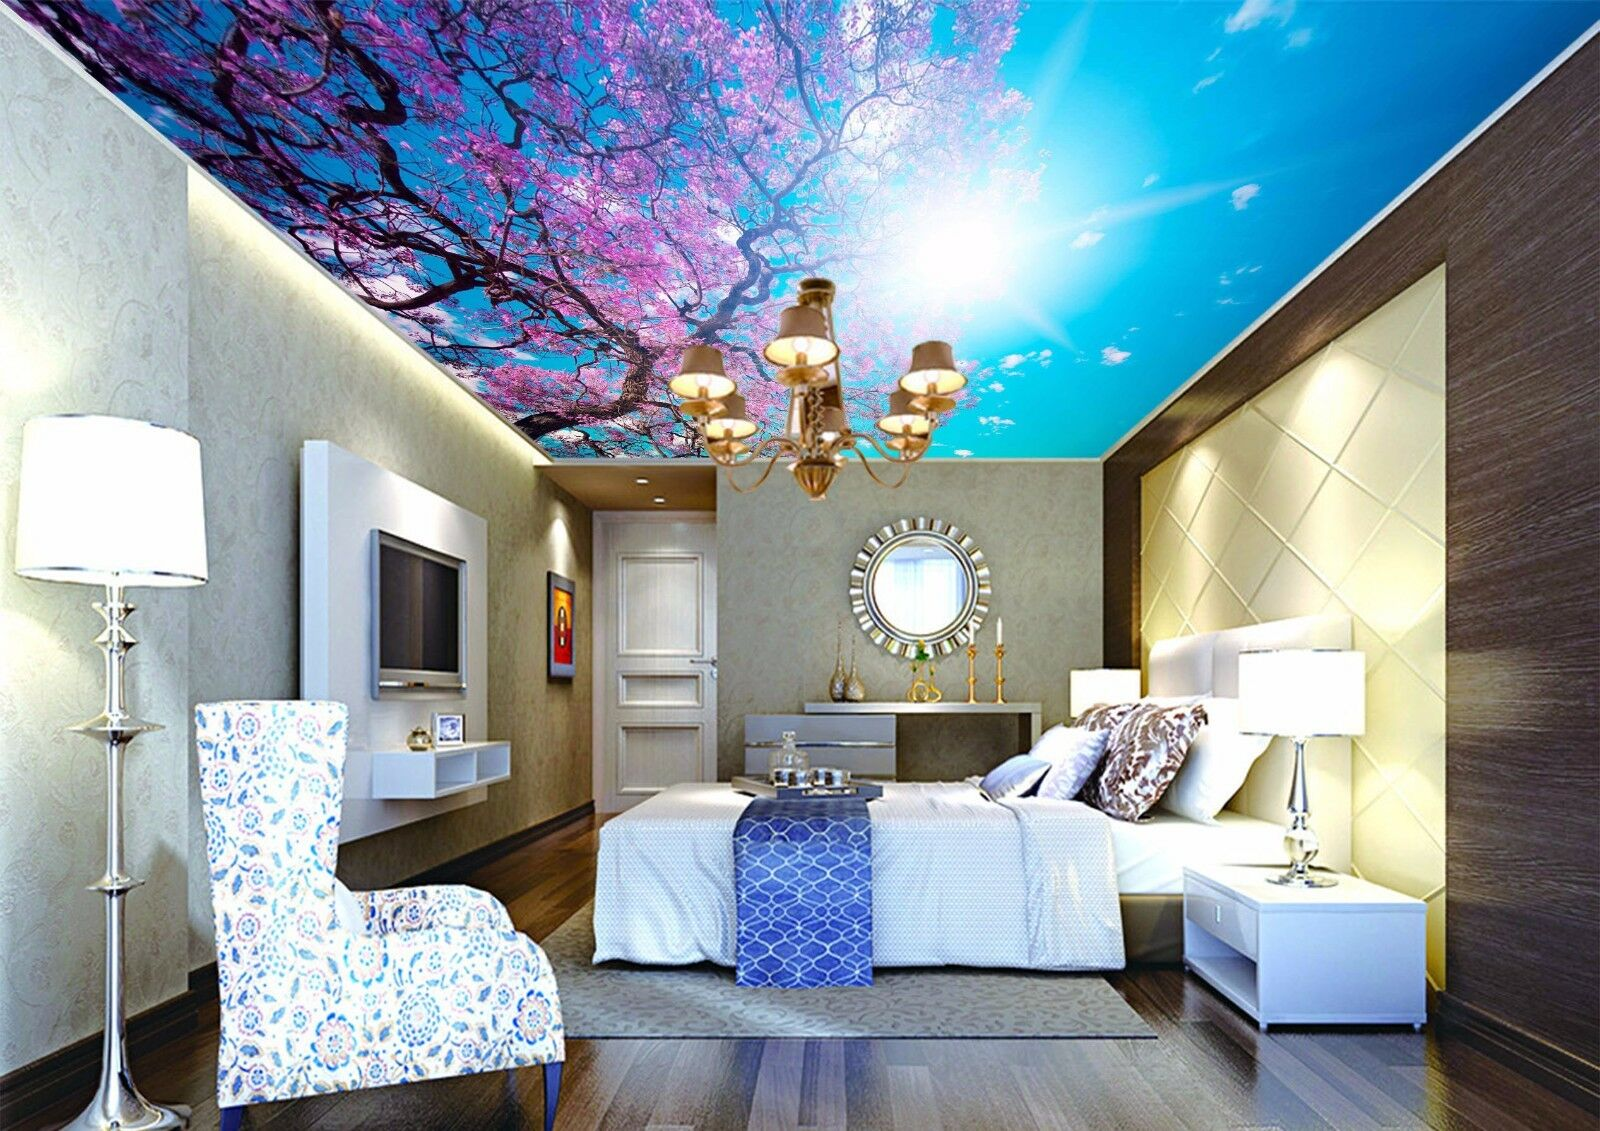 3D Sun Sky Tree 5 Ceiling WallPaper Murals Wall Print Decal Deco AJ WALLPAPER UK